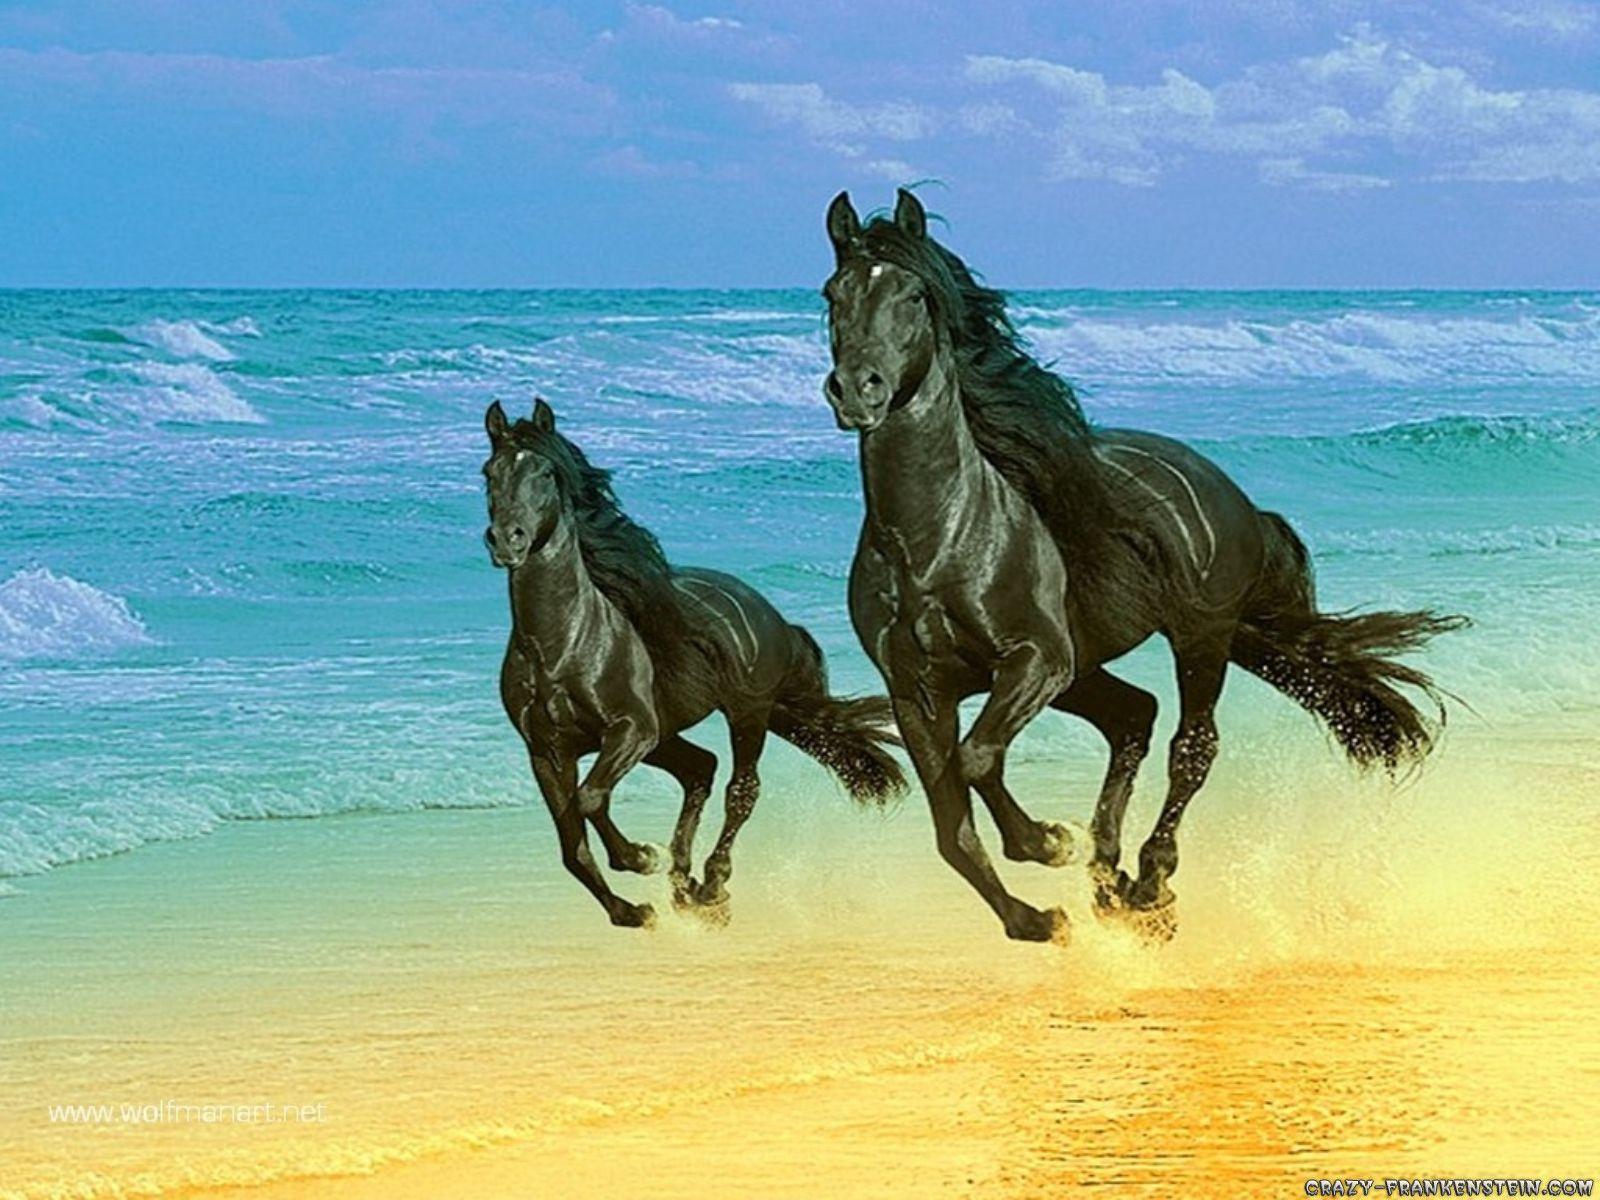 7 Running White Horse Hd Wallpaper Download Labzada Wallpaper